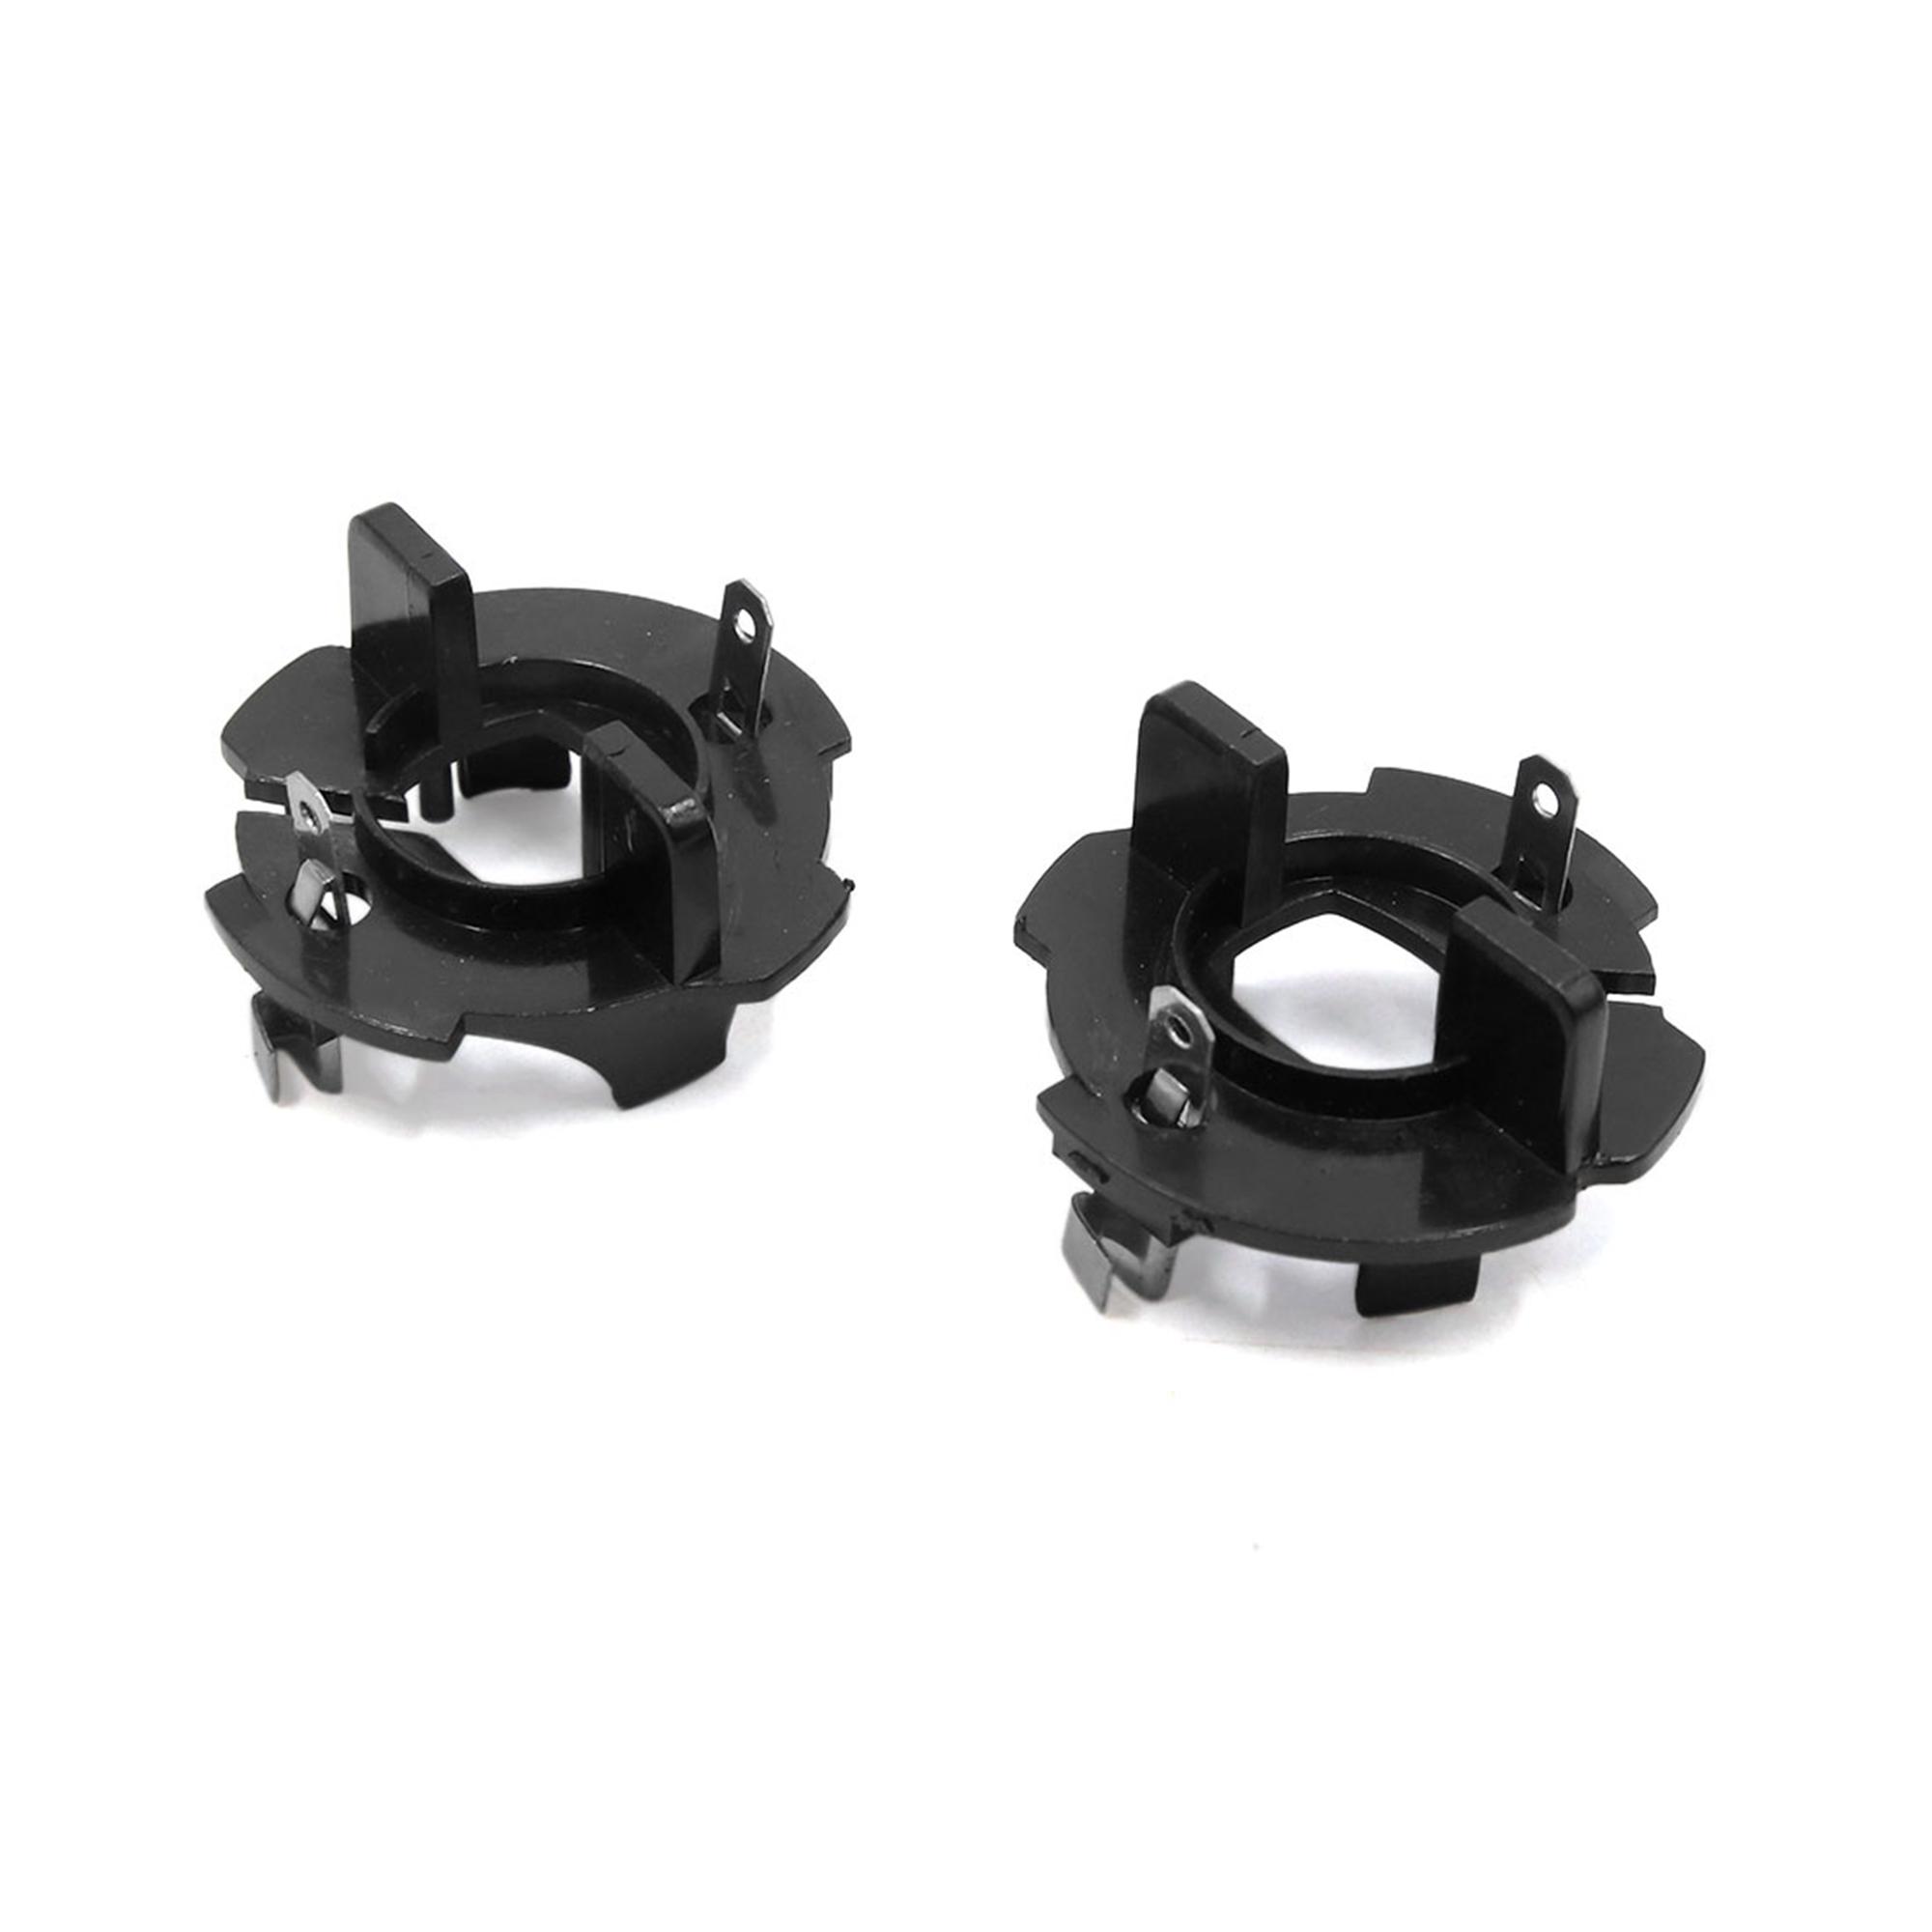 2 Pcs Plastic H7 LED Xenon Headlight Bulb Holder Adapter Base for Golf 5 Caddy